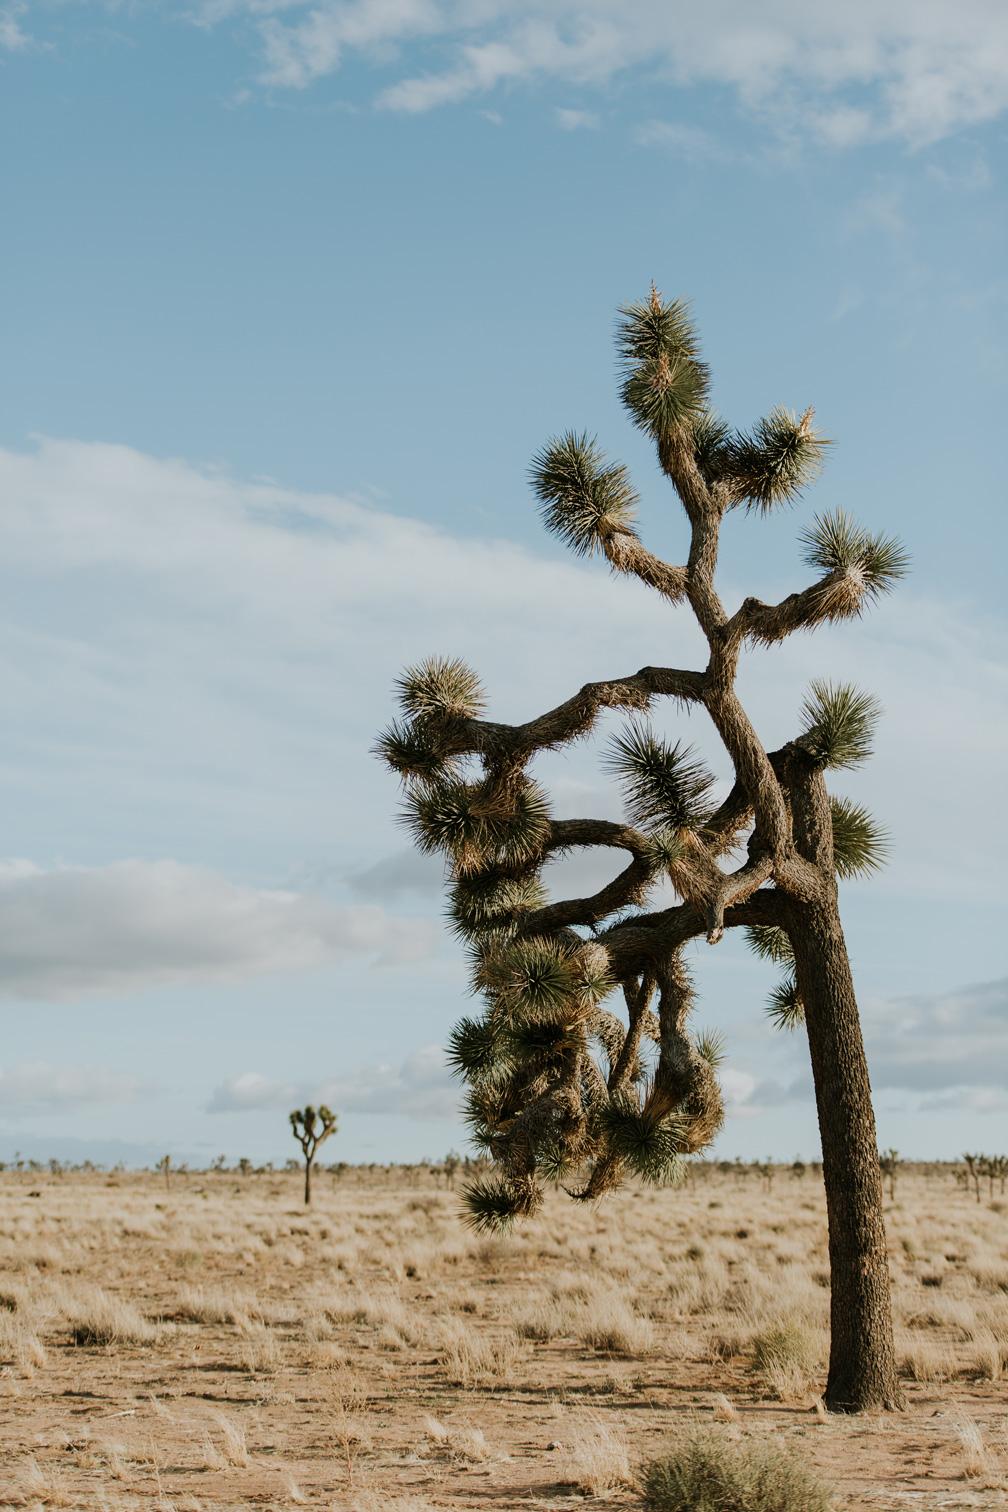 CindyGiovagnoli_Joshua_Tree_National_Park_California_Mojave_Desert_Cholla_Garden_Hidden_Valley_climbing_hiking_camping-019.jpg